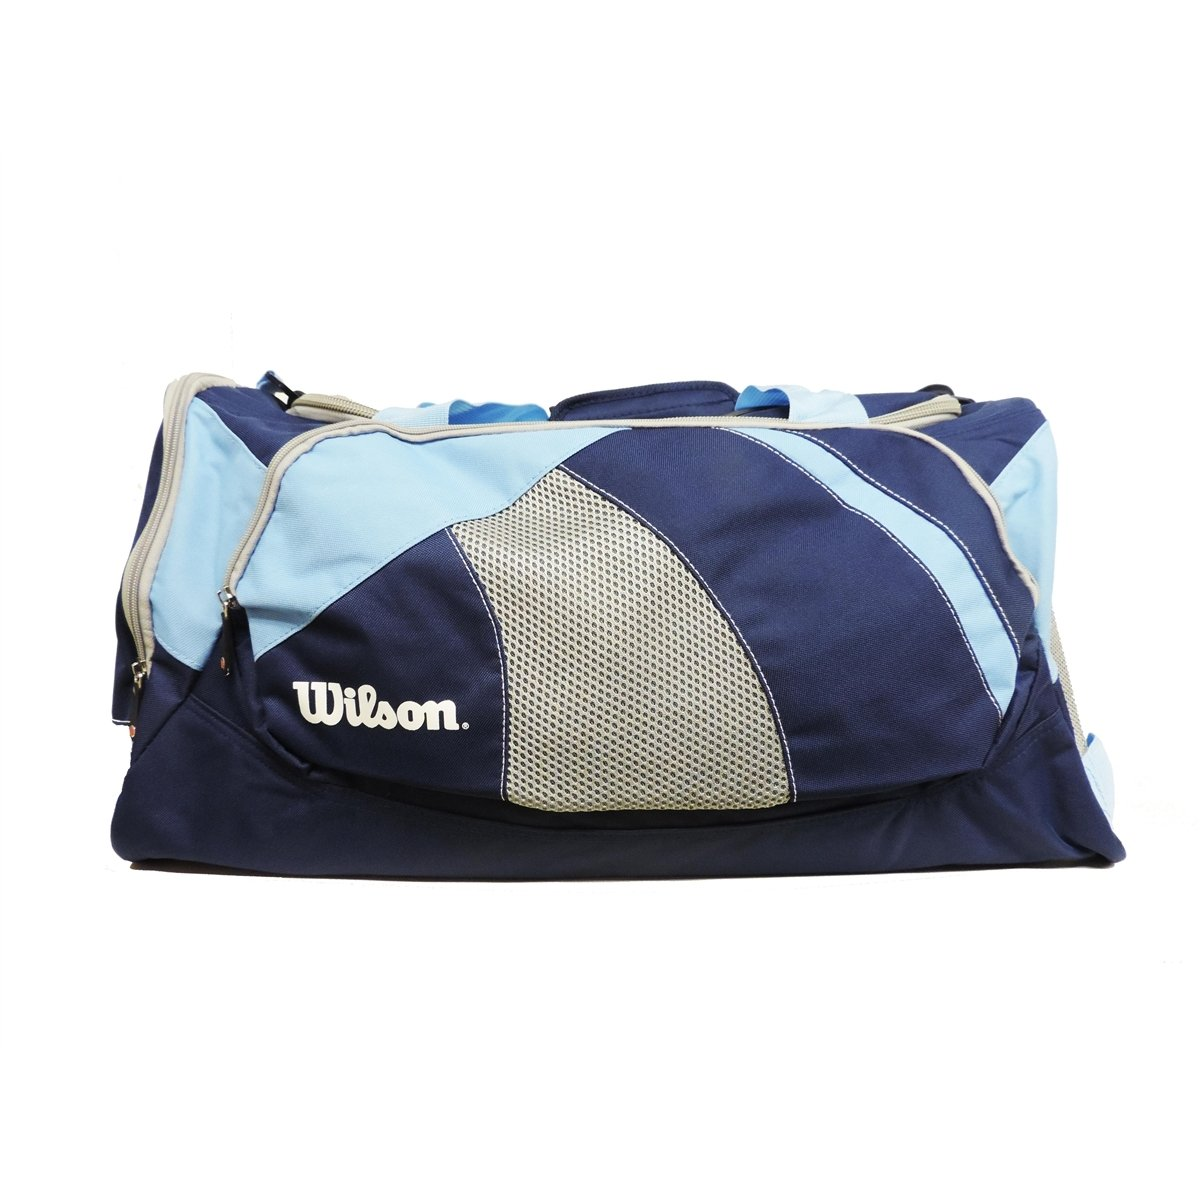 Bolsa Wilson Azul Wtis13346d - Marinho